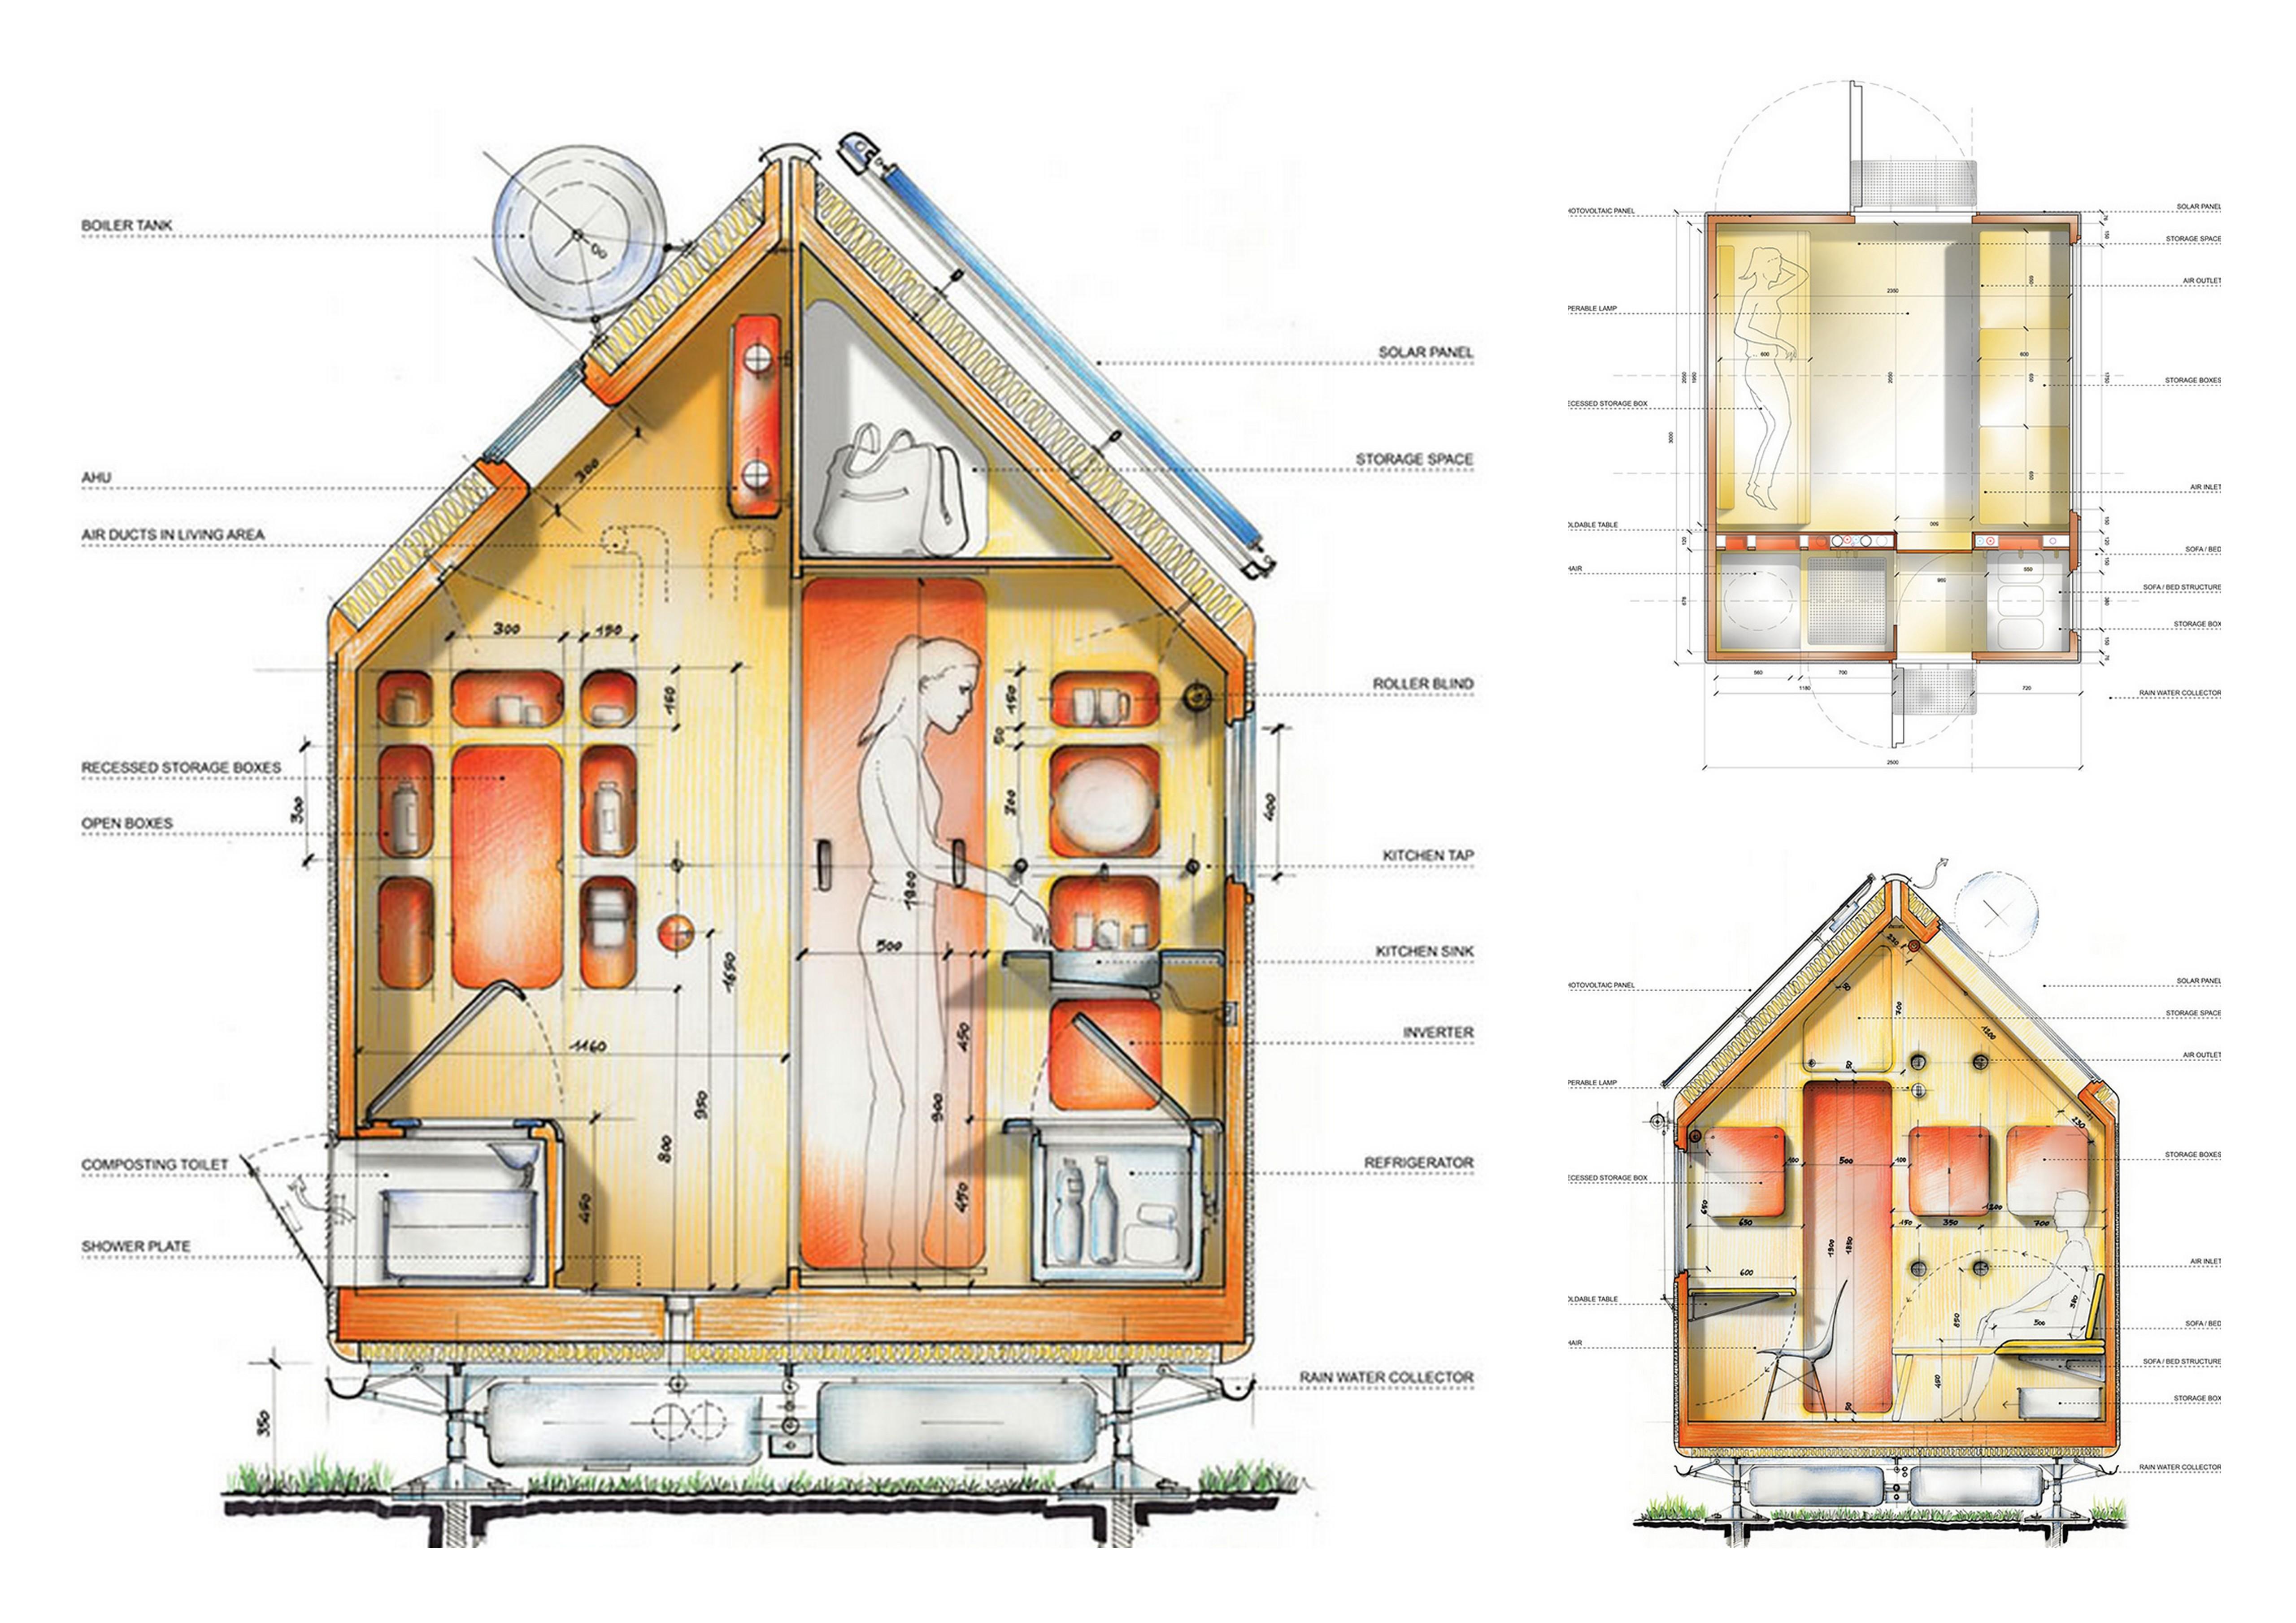 diogene le cabanon autosuffisant de demain la mini. Black Bedroom Furniture Sets. Home Design Ideas